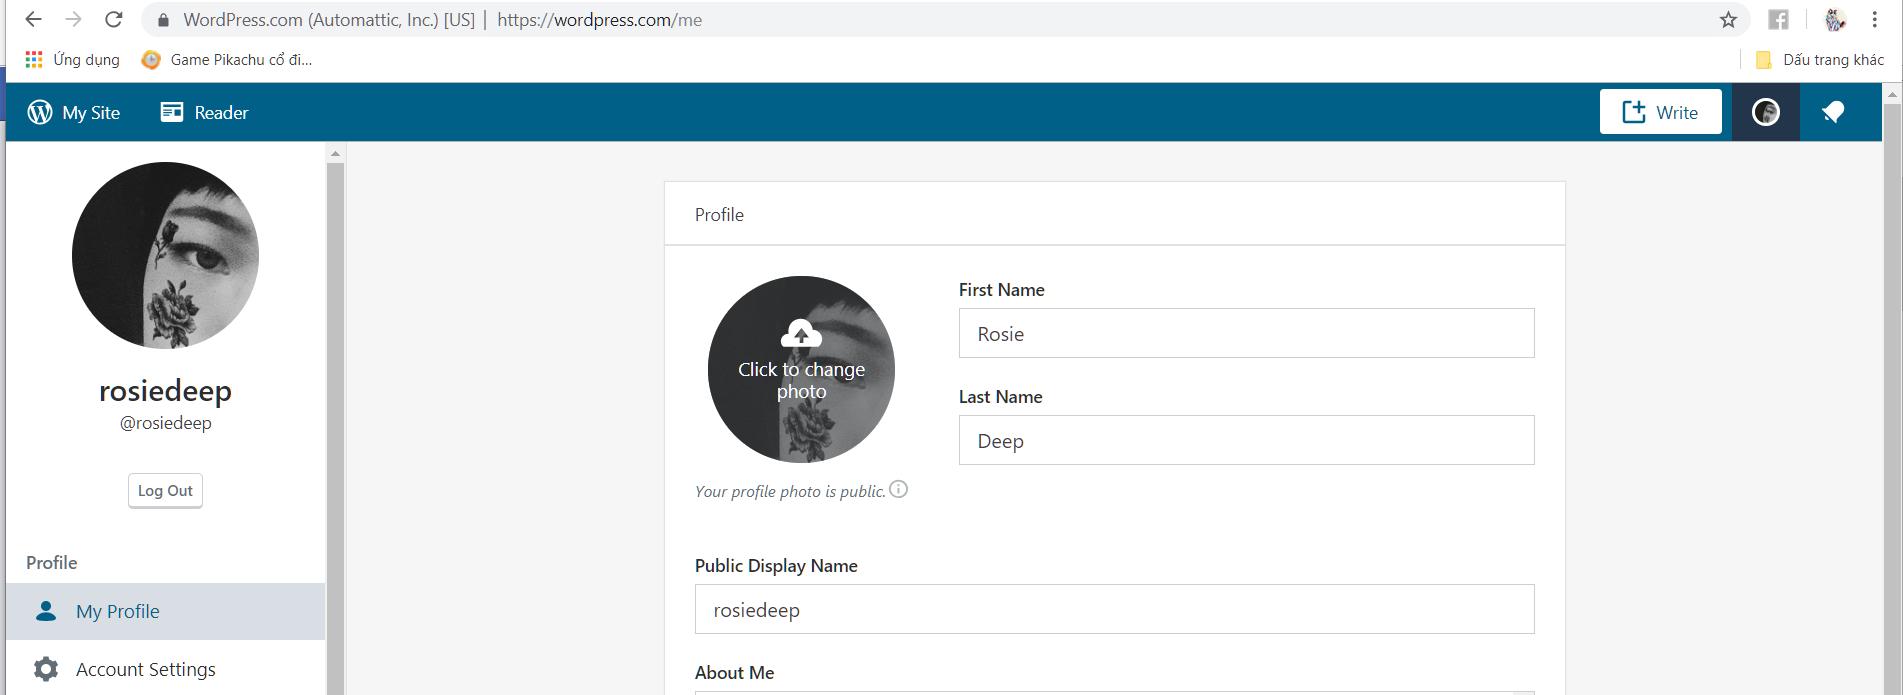 profile page 2